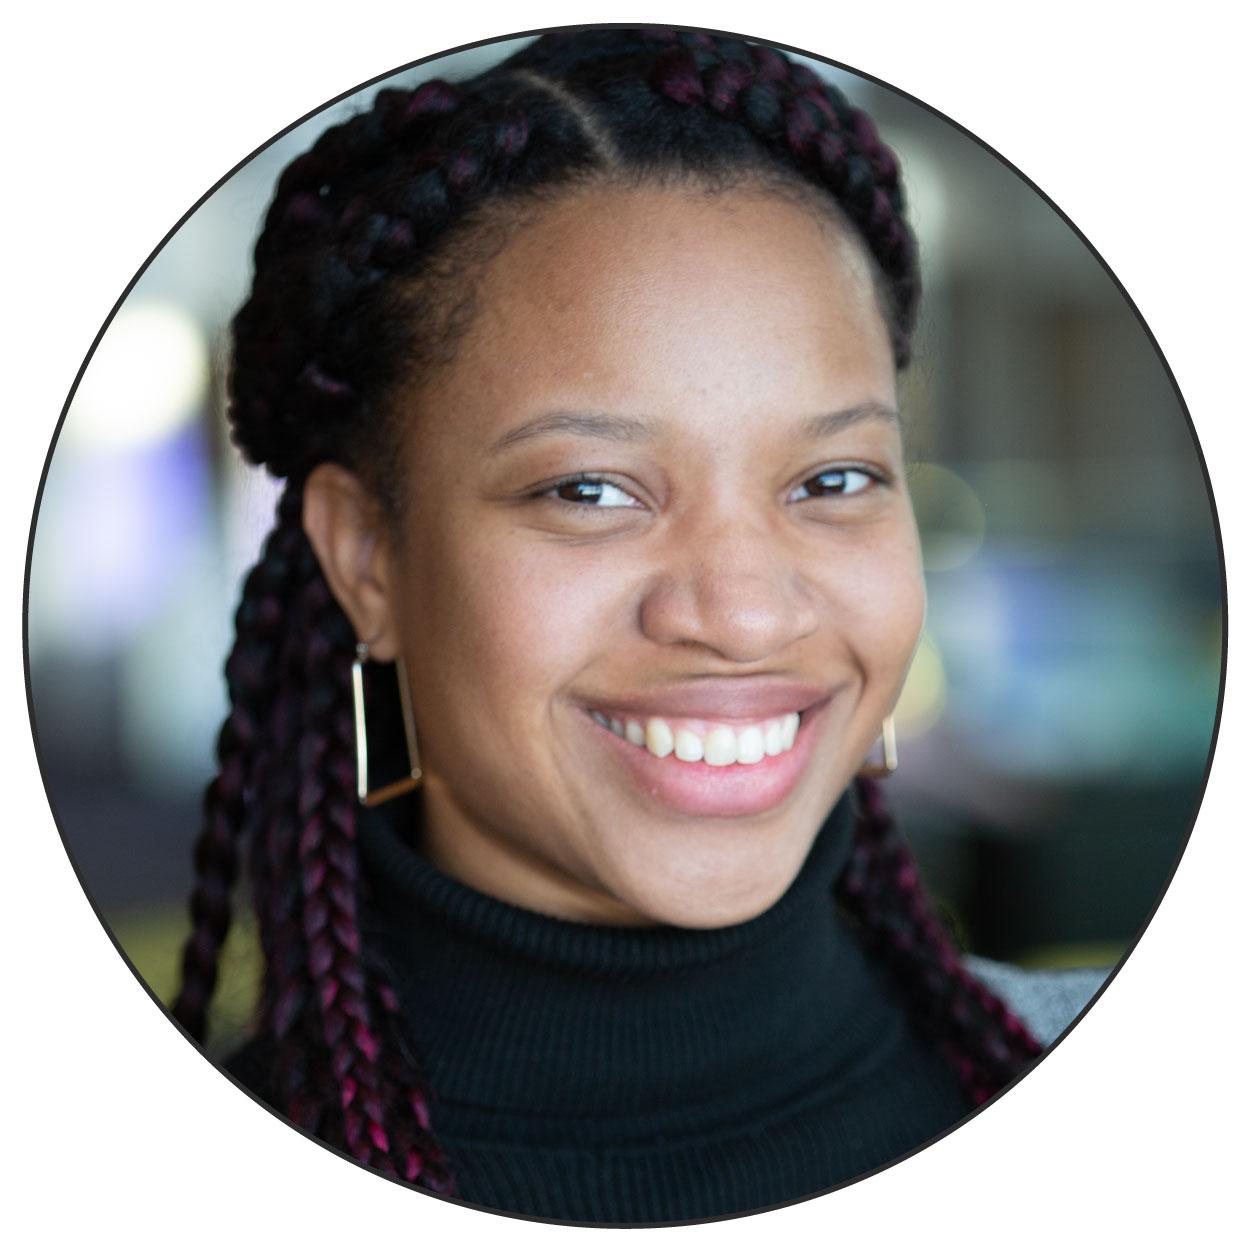 Kaila Epps, Career Coach | Client Testimonial Photo | Tiffany Atkinson Consulting | tiffanyatkinson.com